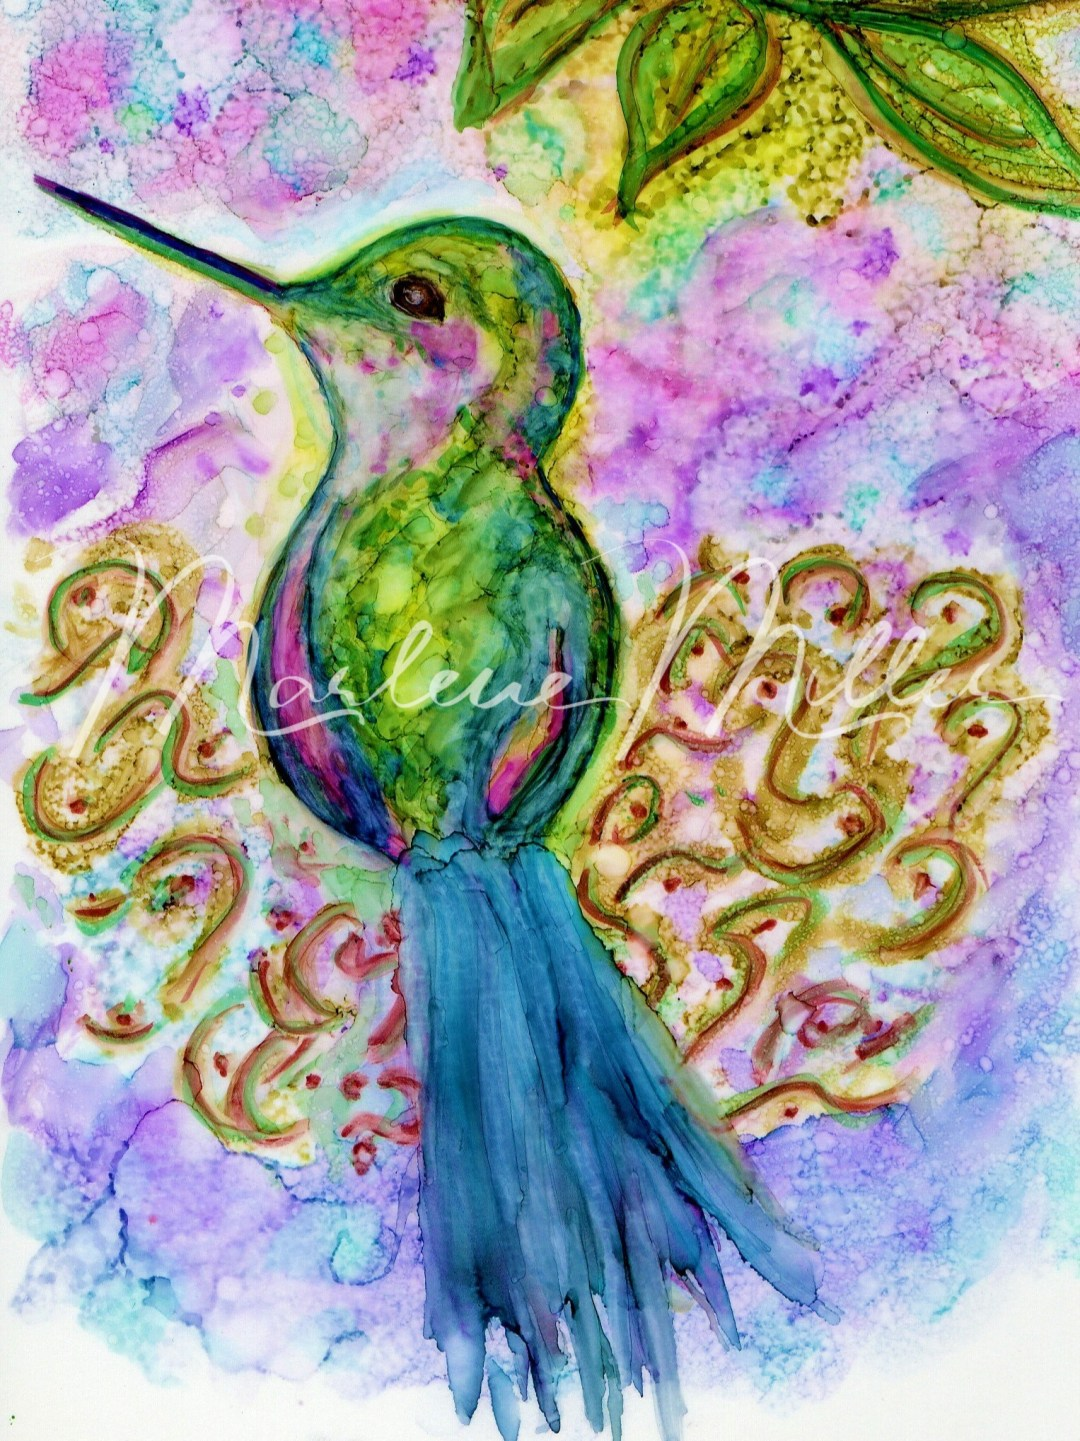 """Hummingbird Nest"" alcohol ink painting"